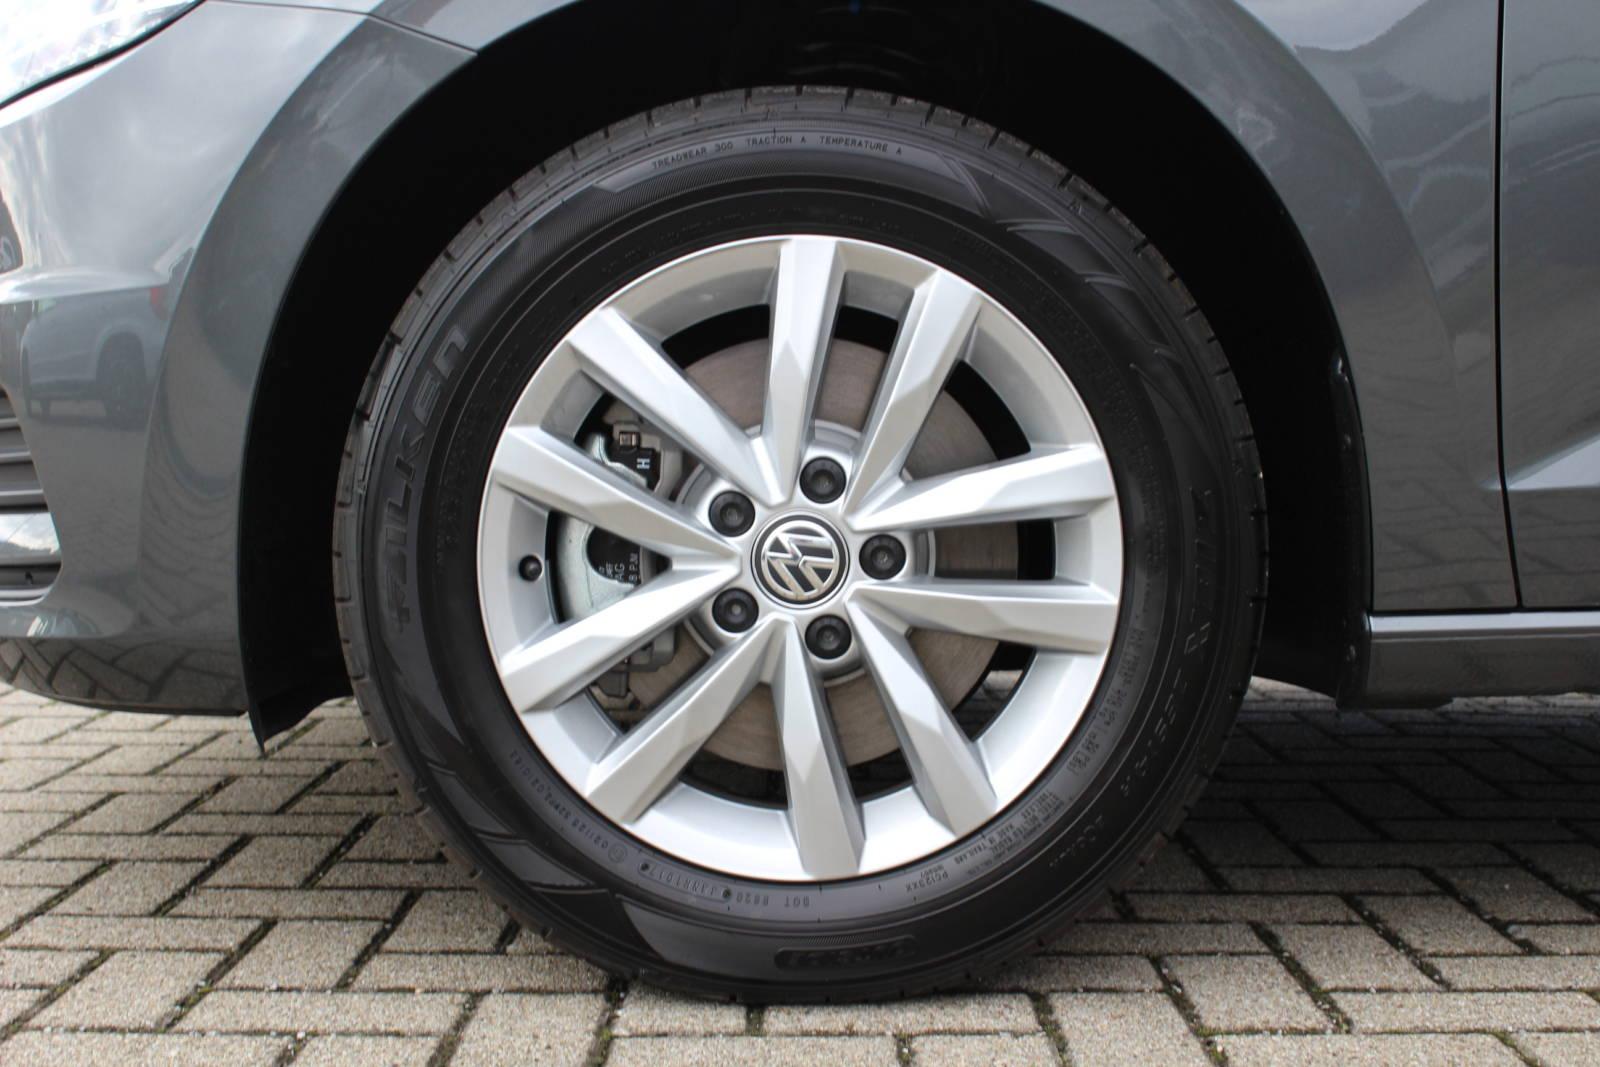 VW Touran Comfortline 1.4 TSI 6-Gang / Deutsche Neufahrzeuge und EU-Neufahrzeuge – Aha! Fahrzeughandel GmbH in Althengstett